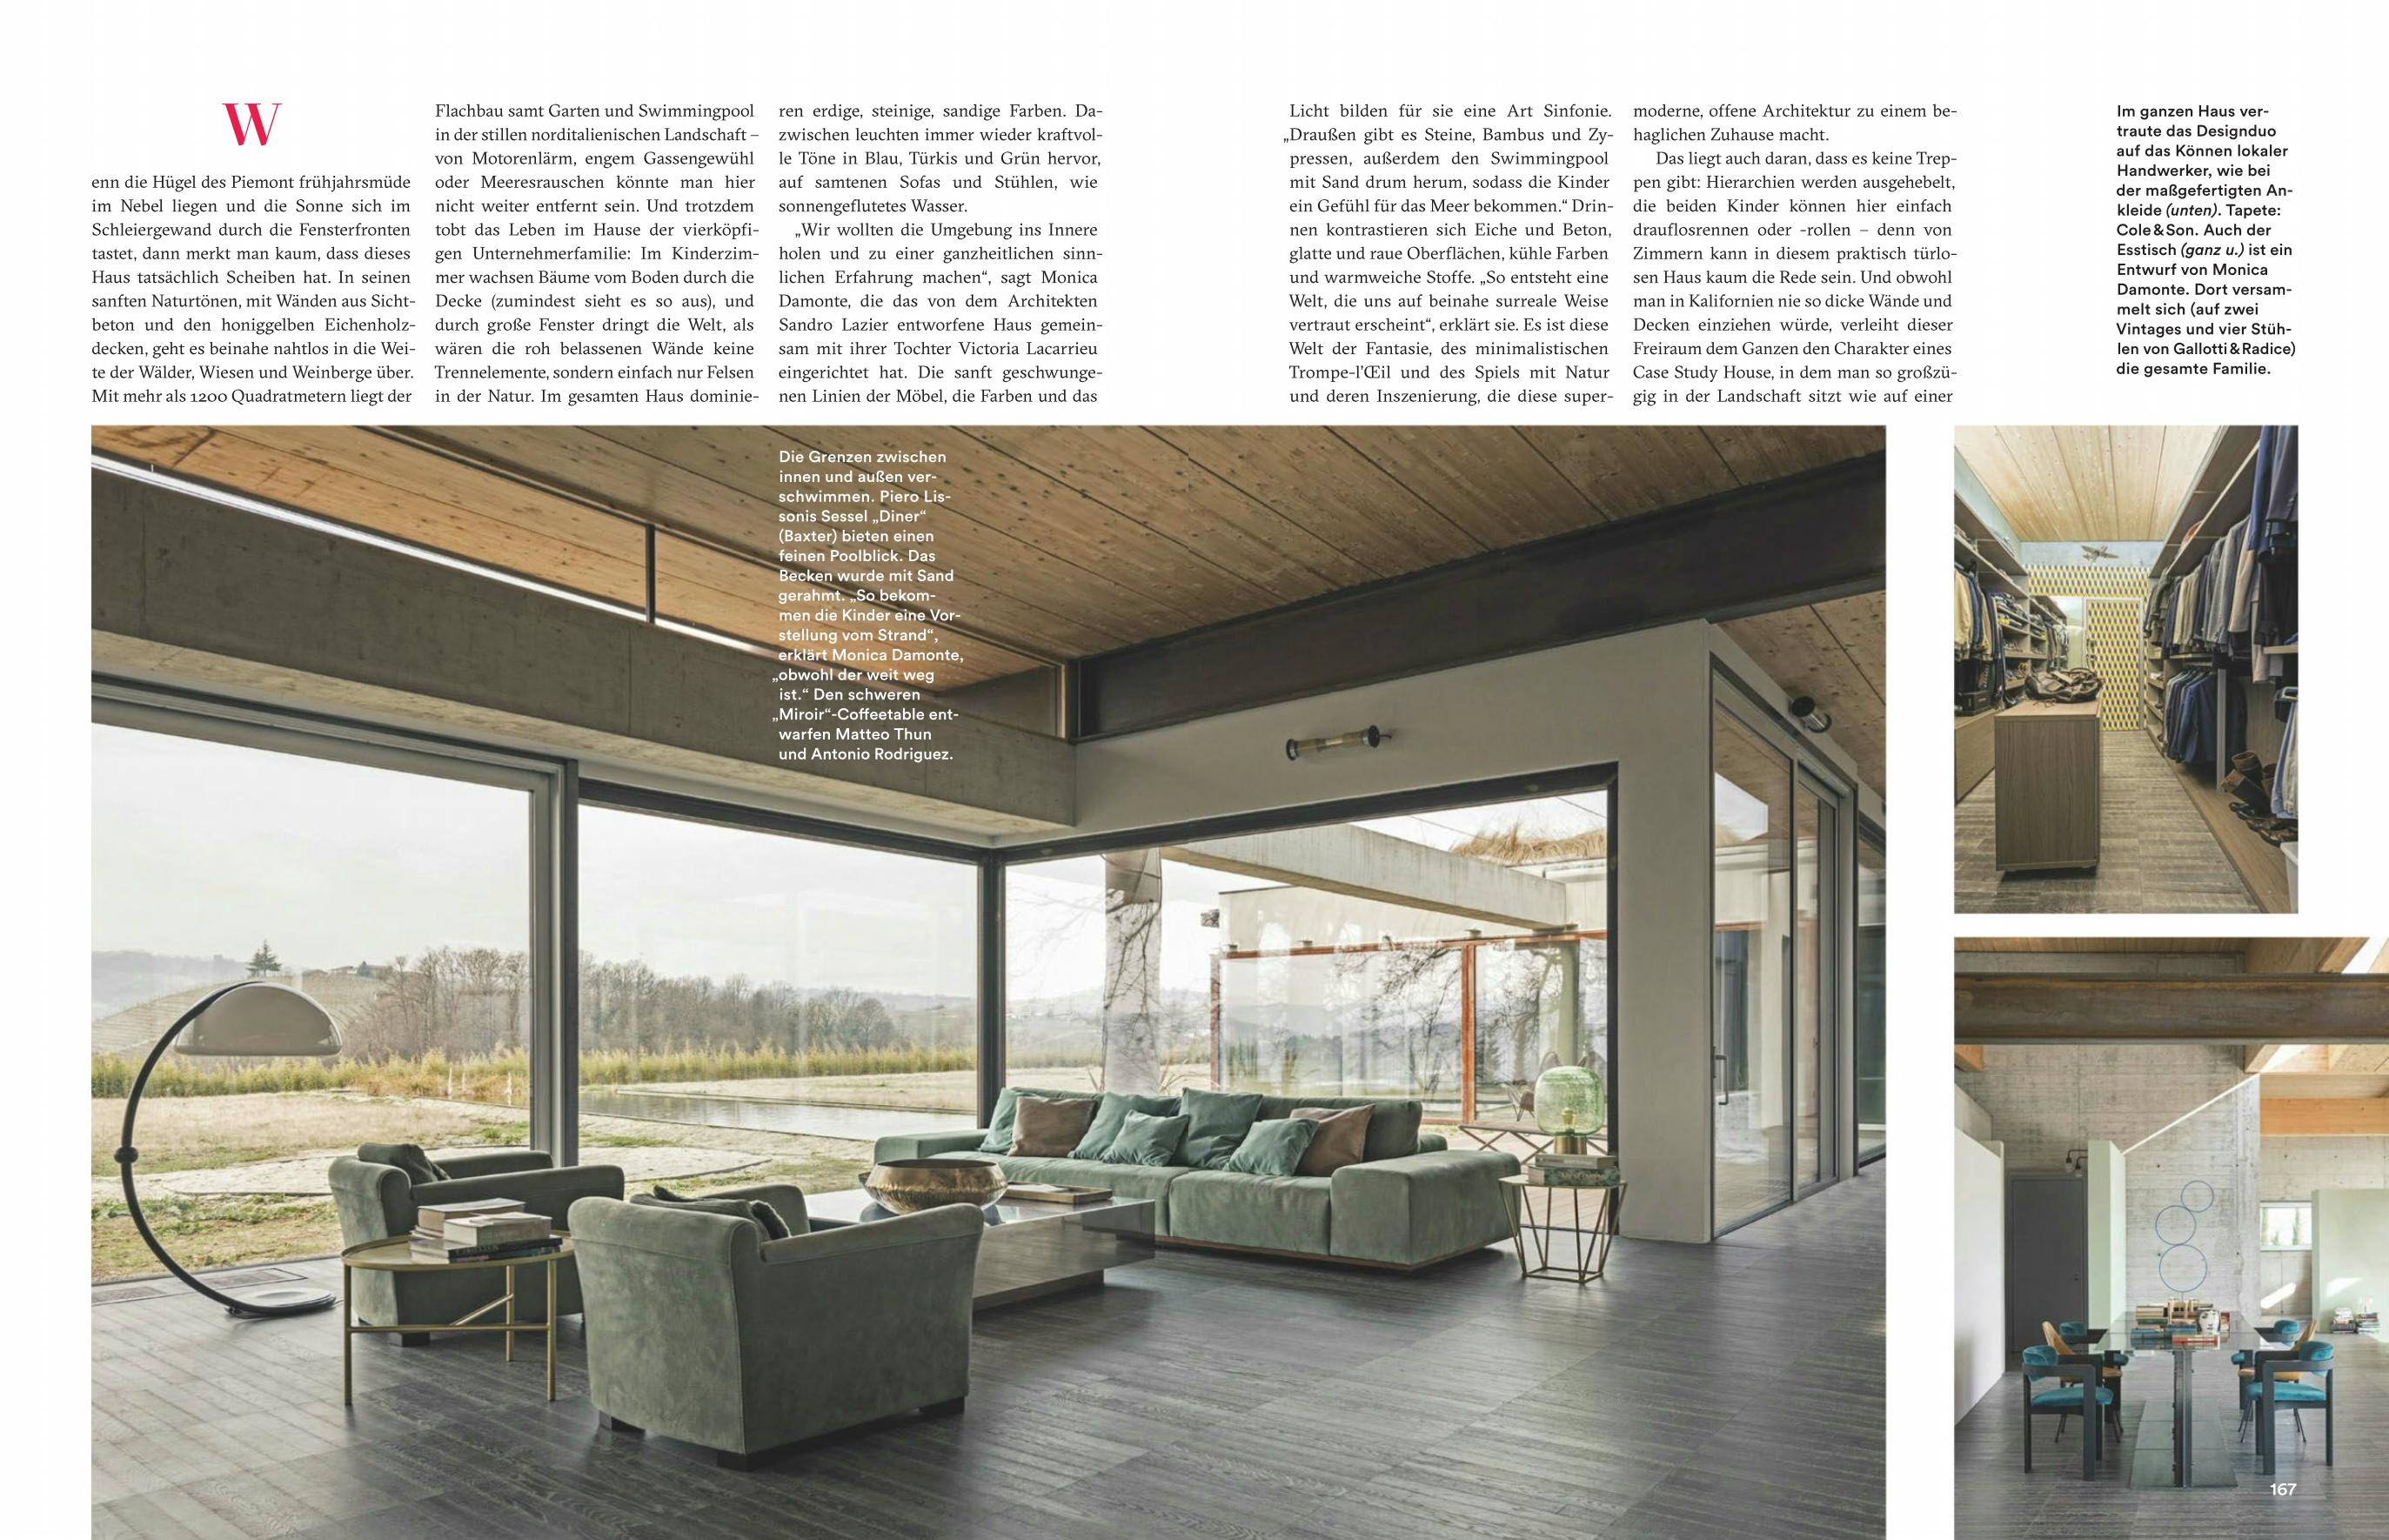 Designer Len Esstisch ad germania damonte lacarrieu interiors project press